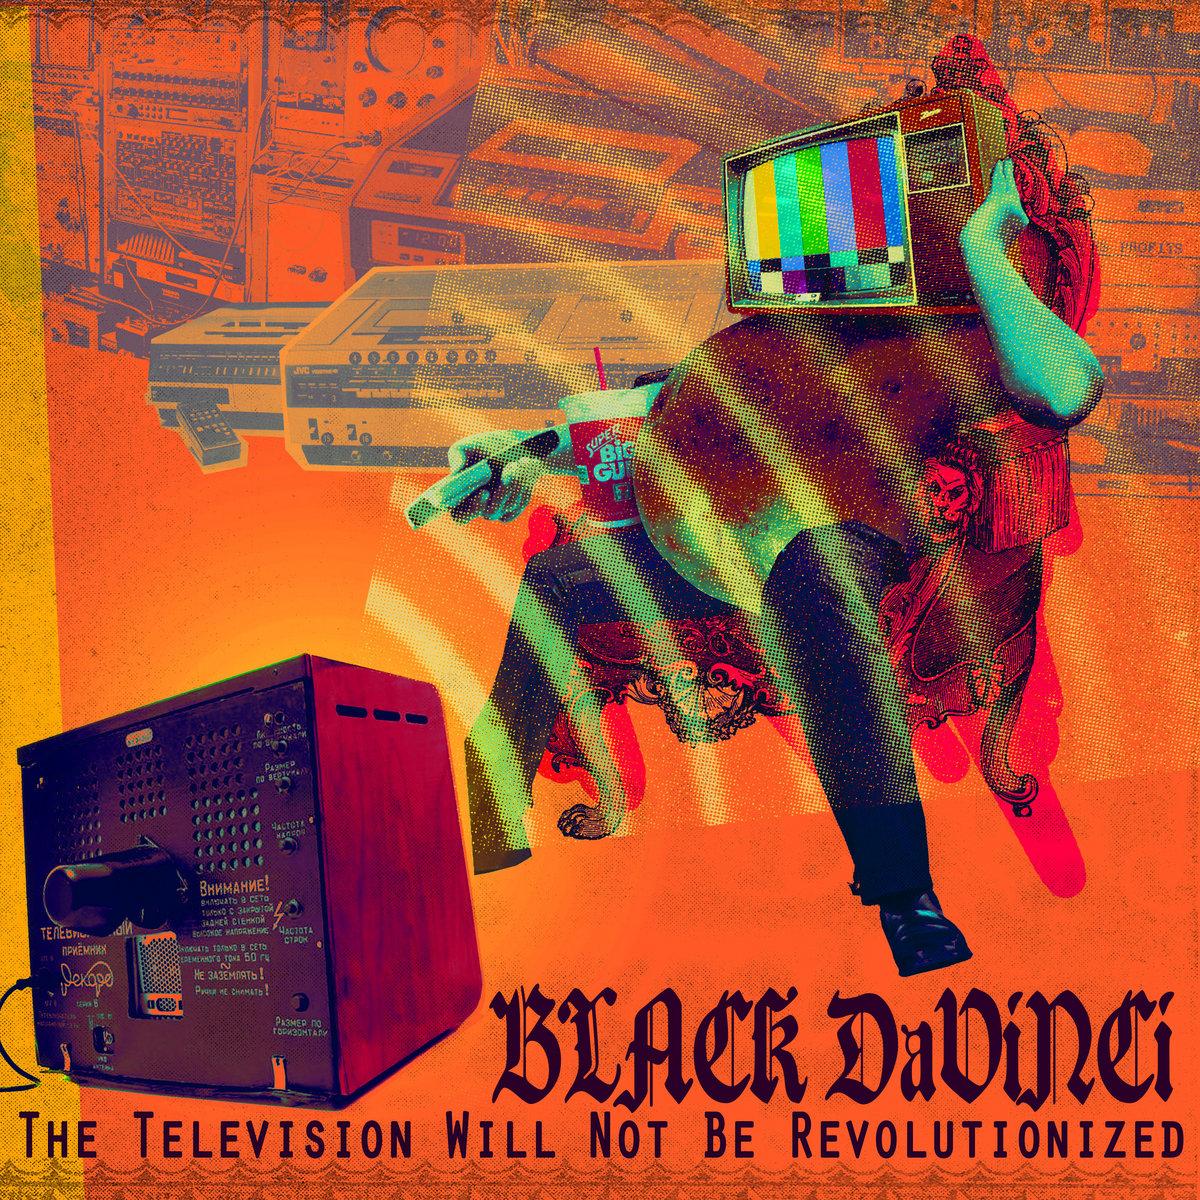 b.i.t.p.o.r.n. (the presence) | black davinci